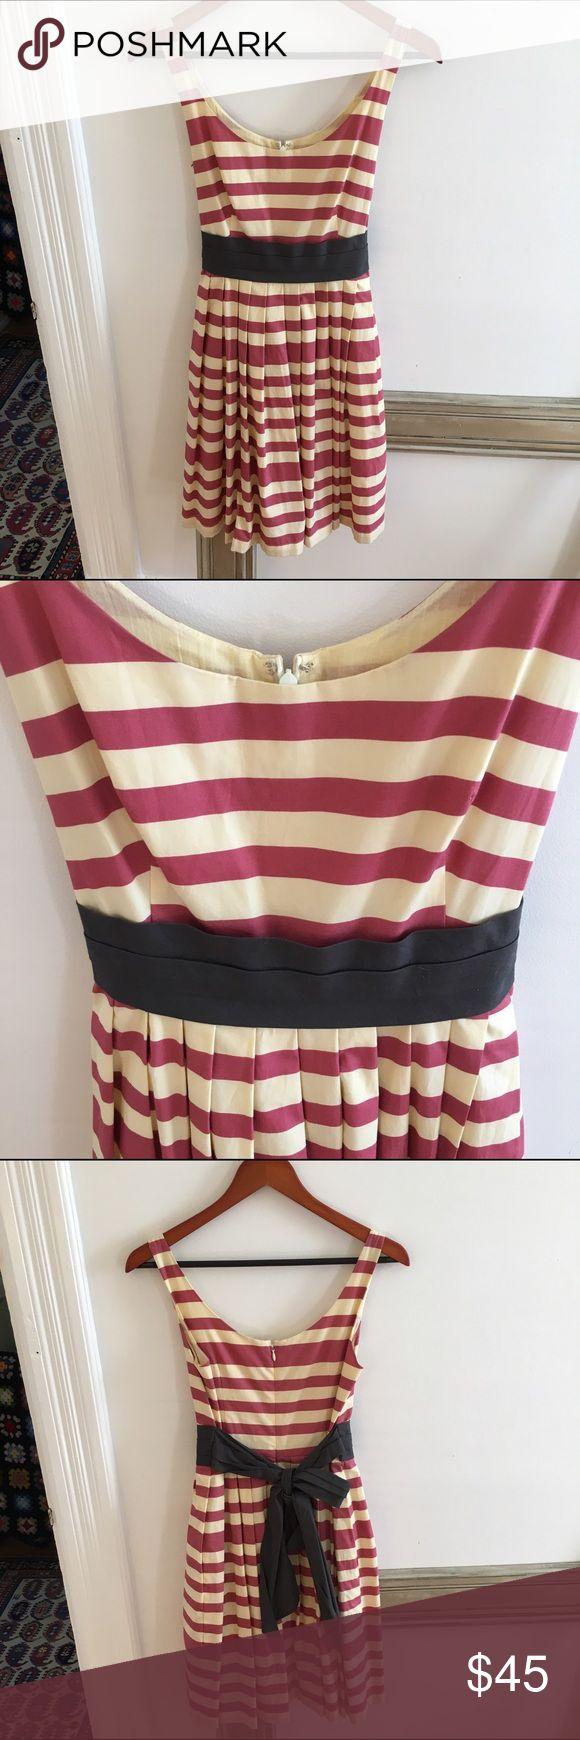 Corey Lynn Calter Striped Dress Anthropologie brand Corey Lynn Calter striped dress with tie. Zips in back, full skirt and pockets. EUC. Anthropologie Dresses